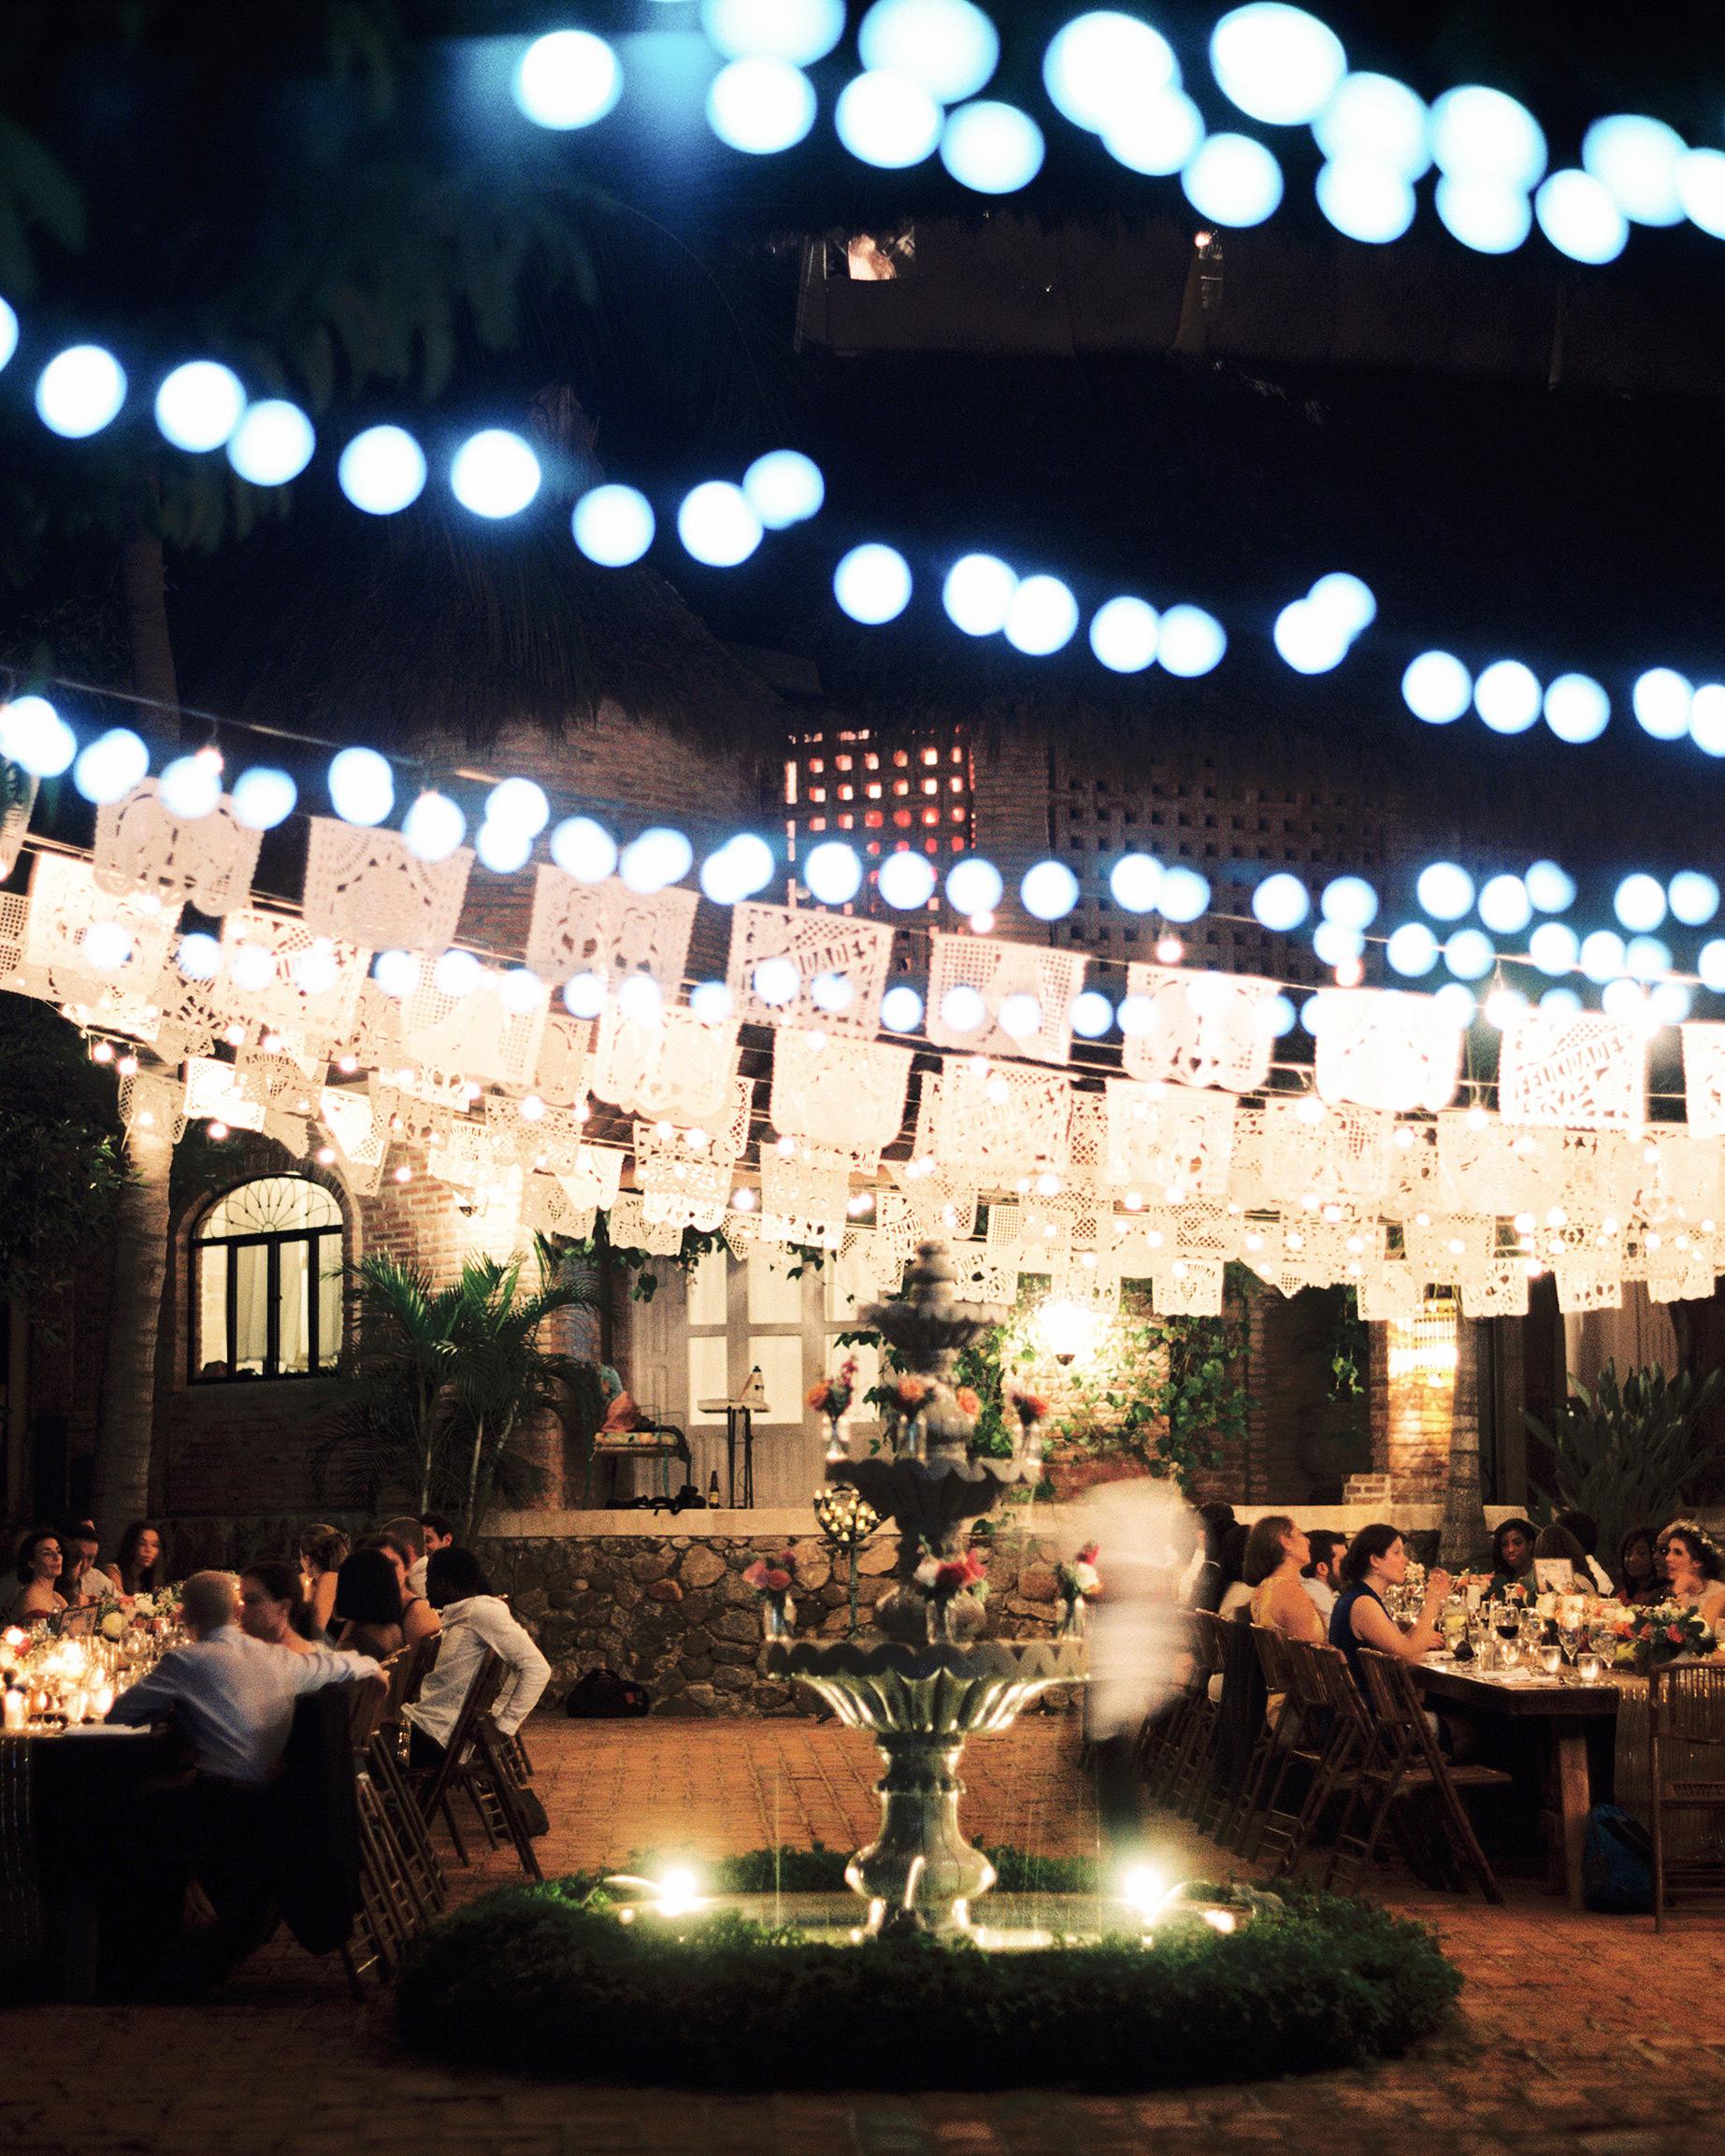 rebecca-eji-wedding-reception-487-s113057-0616.jpg